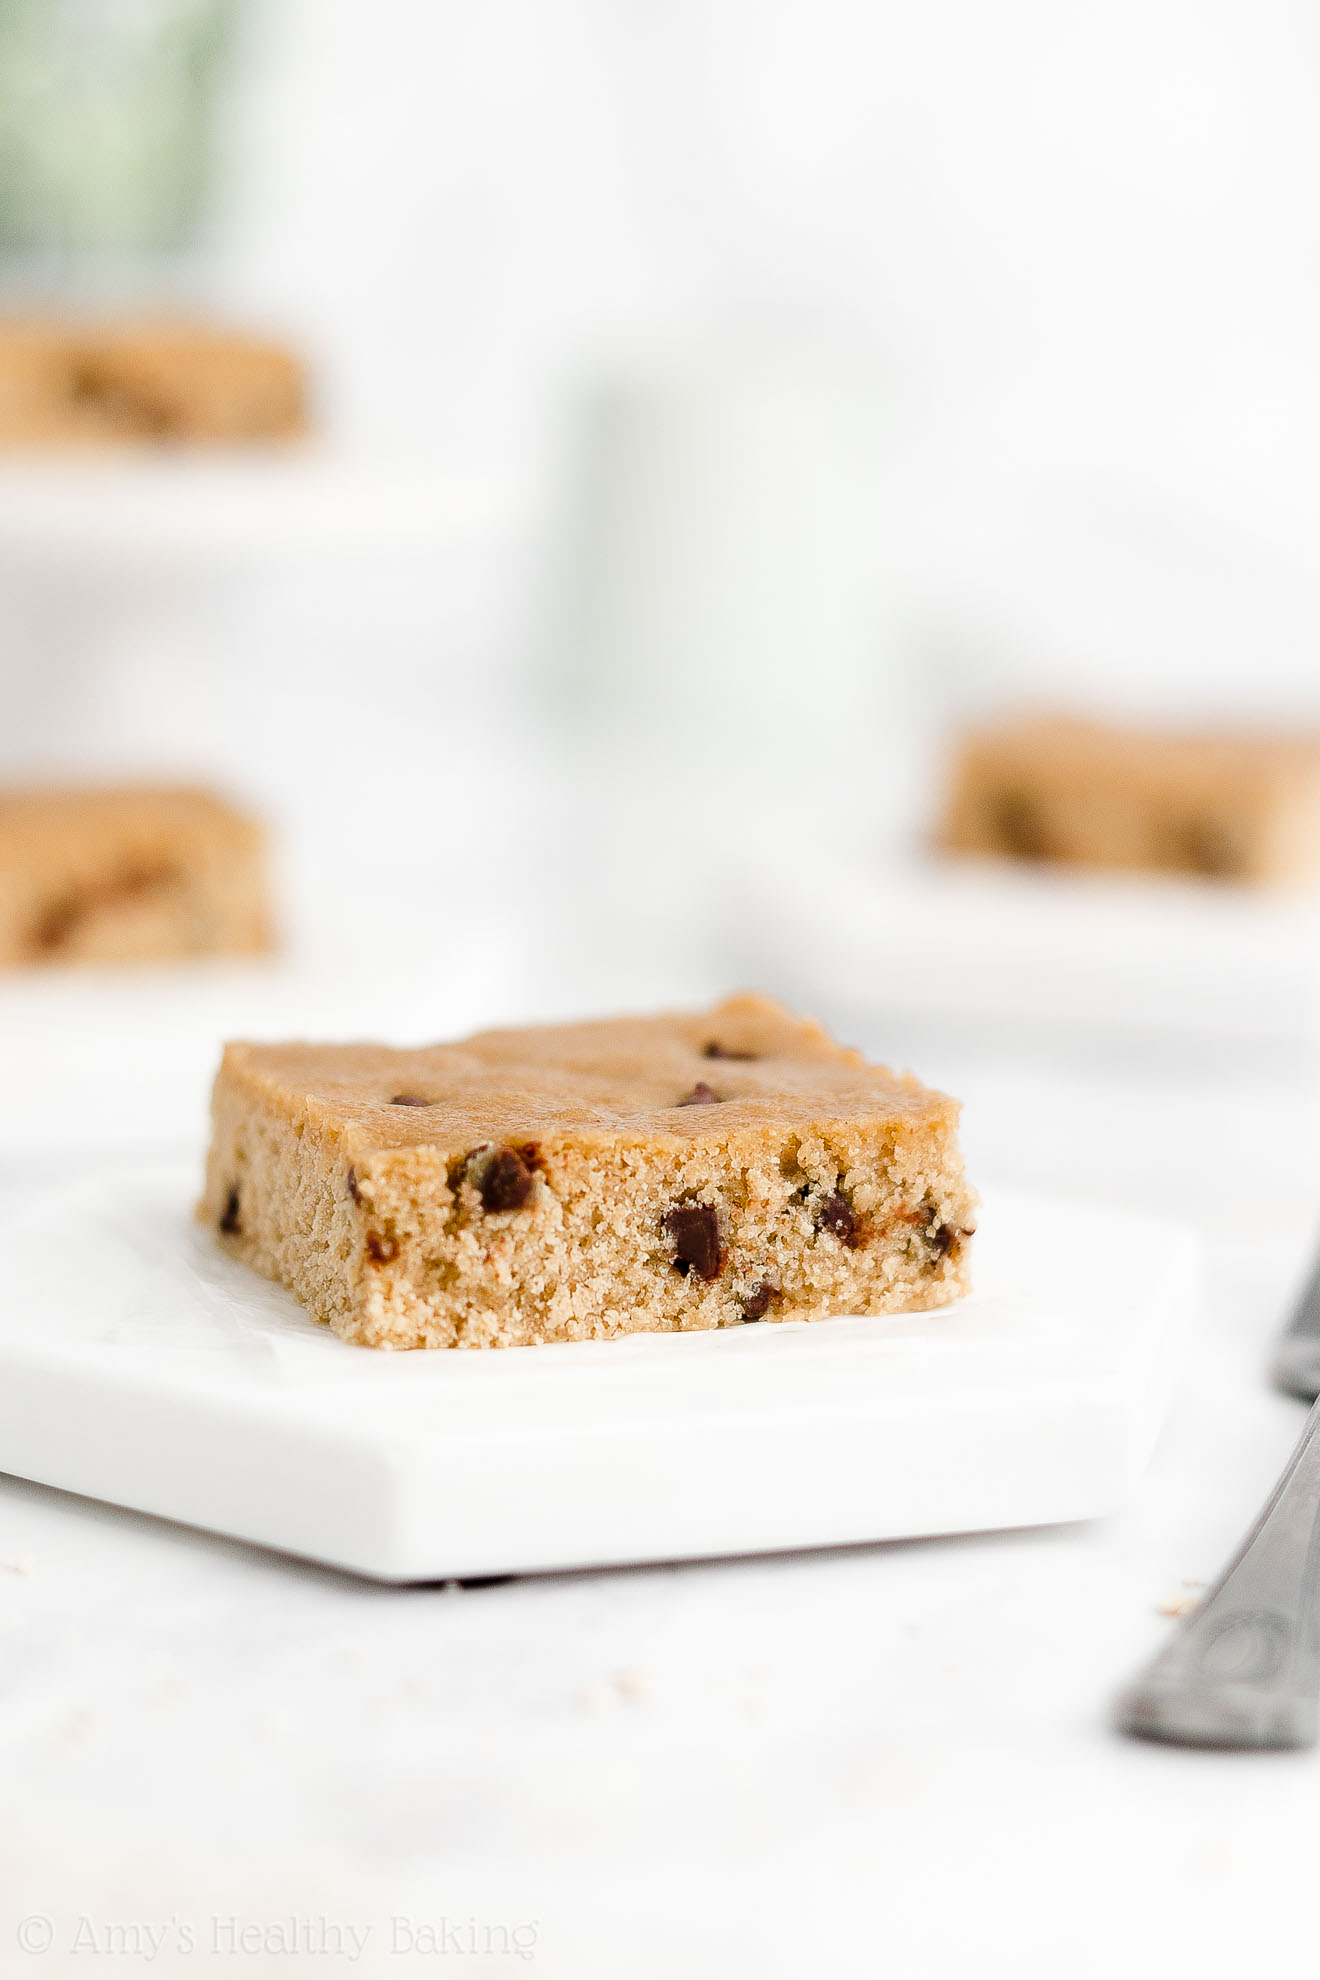 Easy Healthy Gluten Free Vegan Fudgy One Bowl Flourless Chocolate Chip Blondies